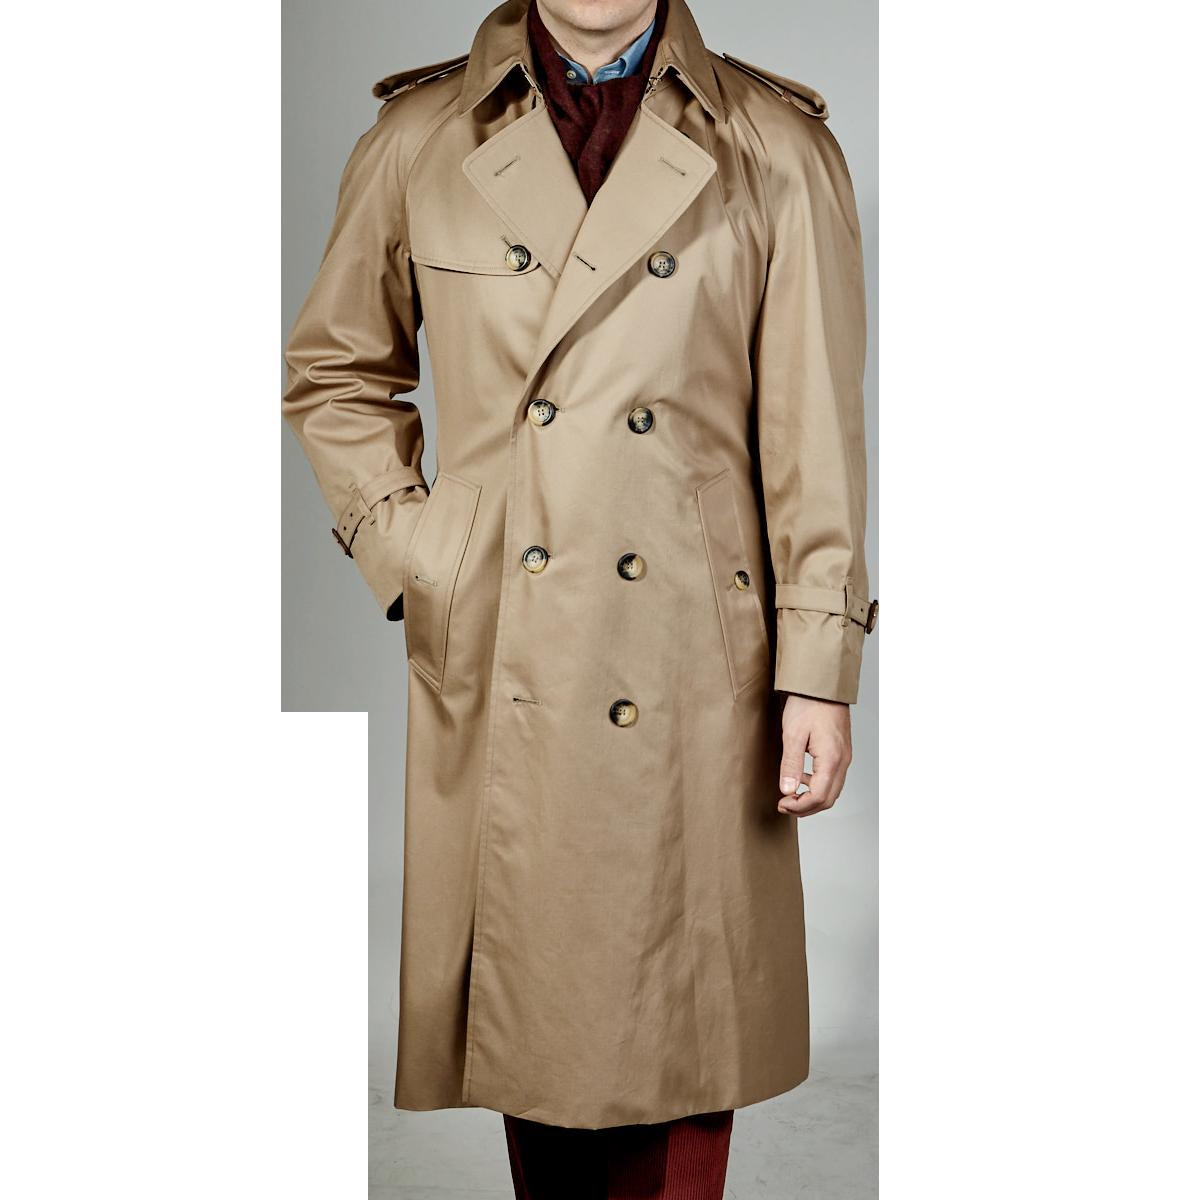 newest 3e08c d6ba1 Grenfell - Beige Windsor Cotton Trench Coat | Baltzar